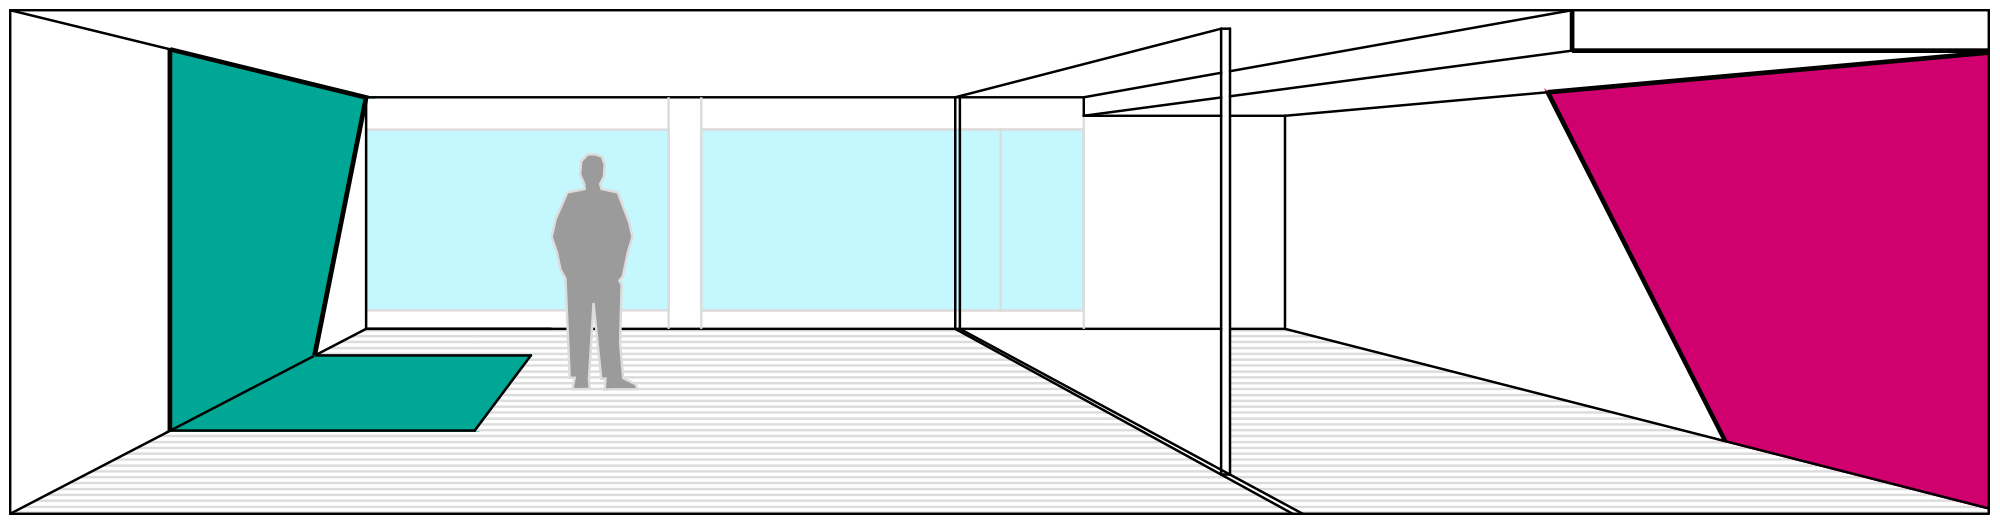 plano oficinas7